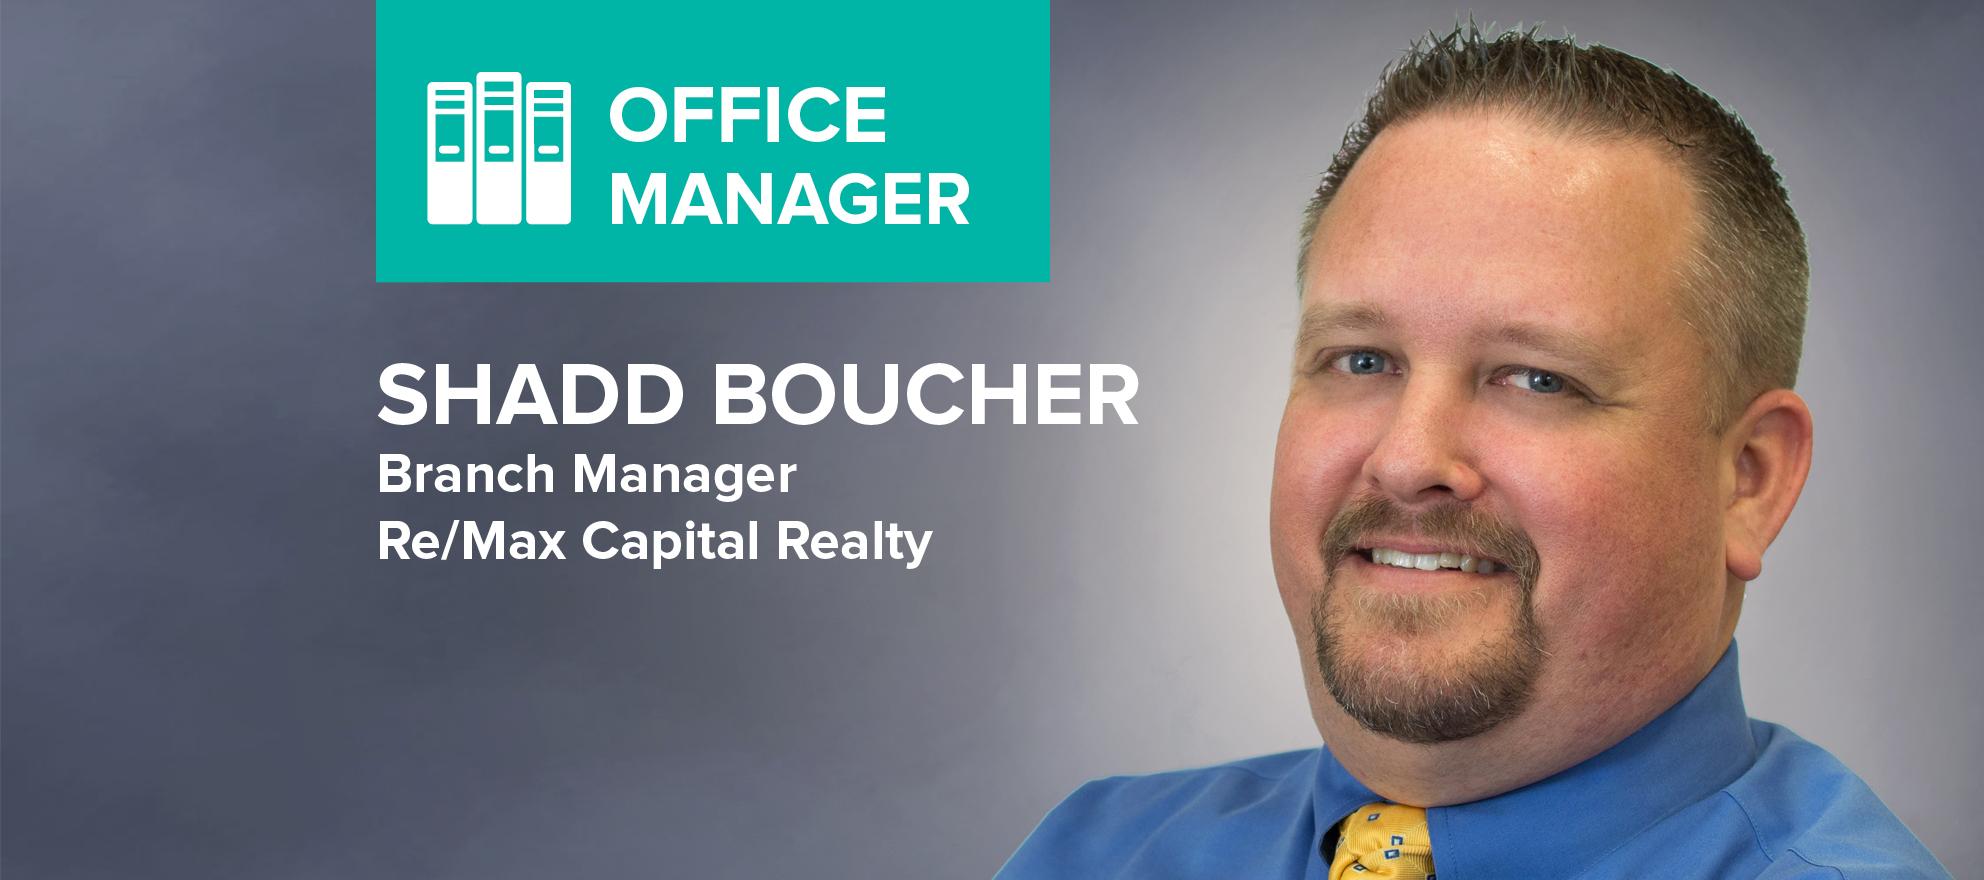 Shadd Boucher: 'I love the